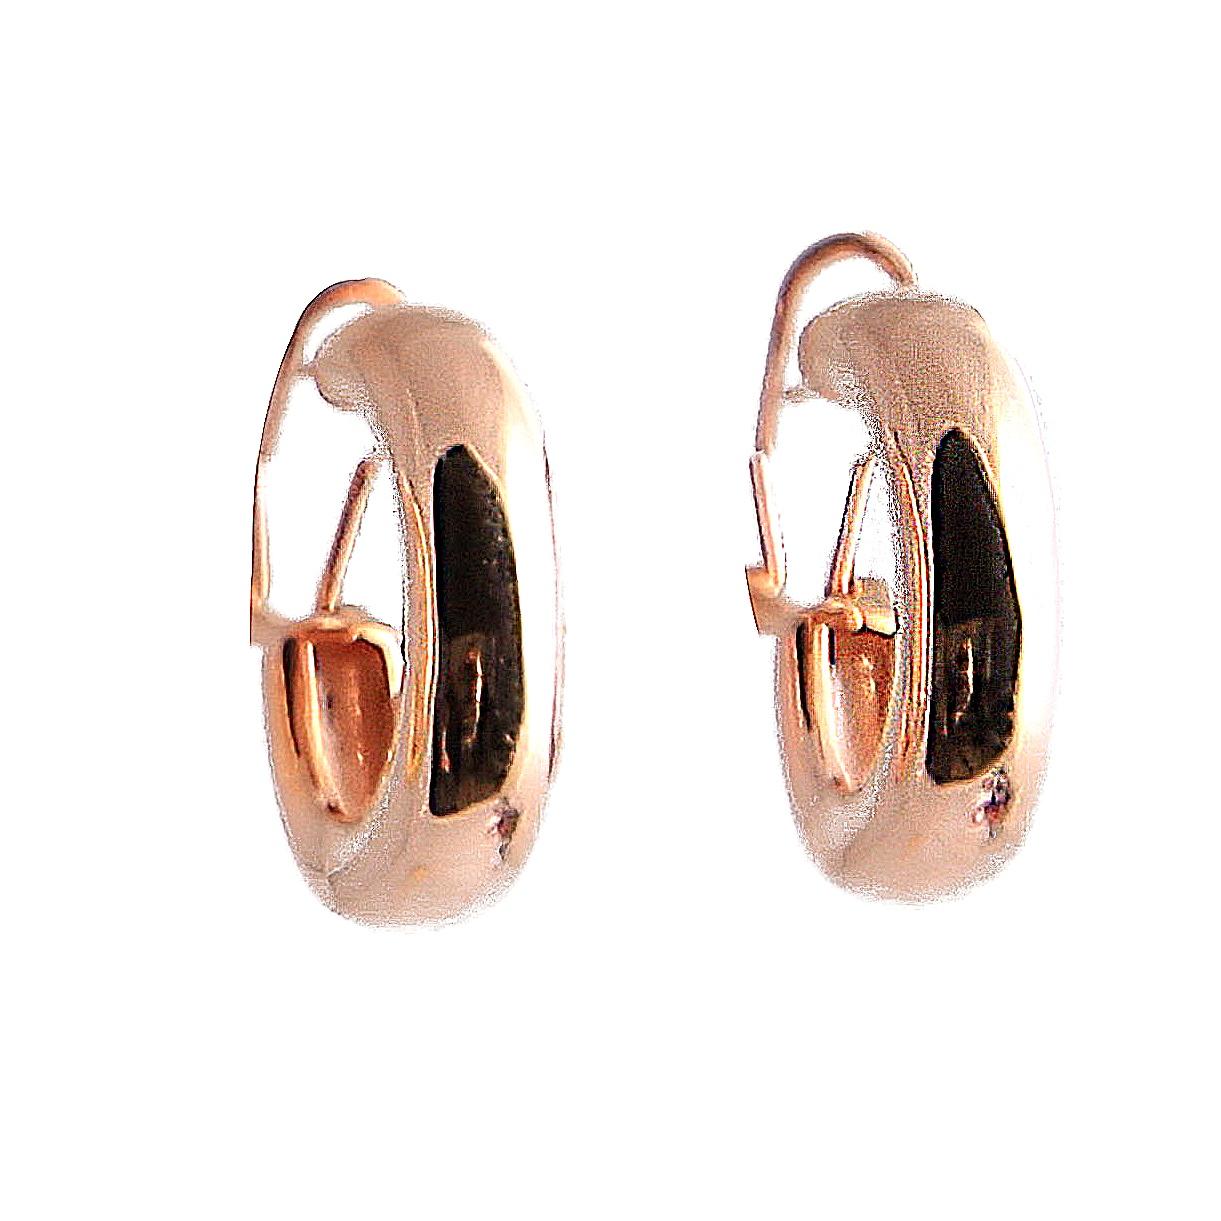 Bauer Basics - Ear Rings Rosegold Large